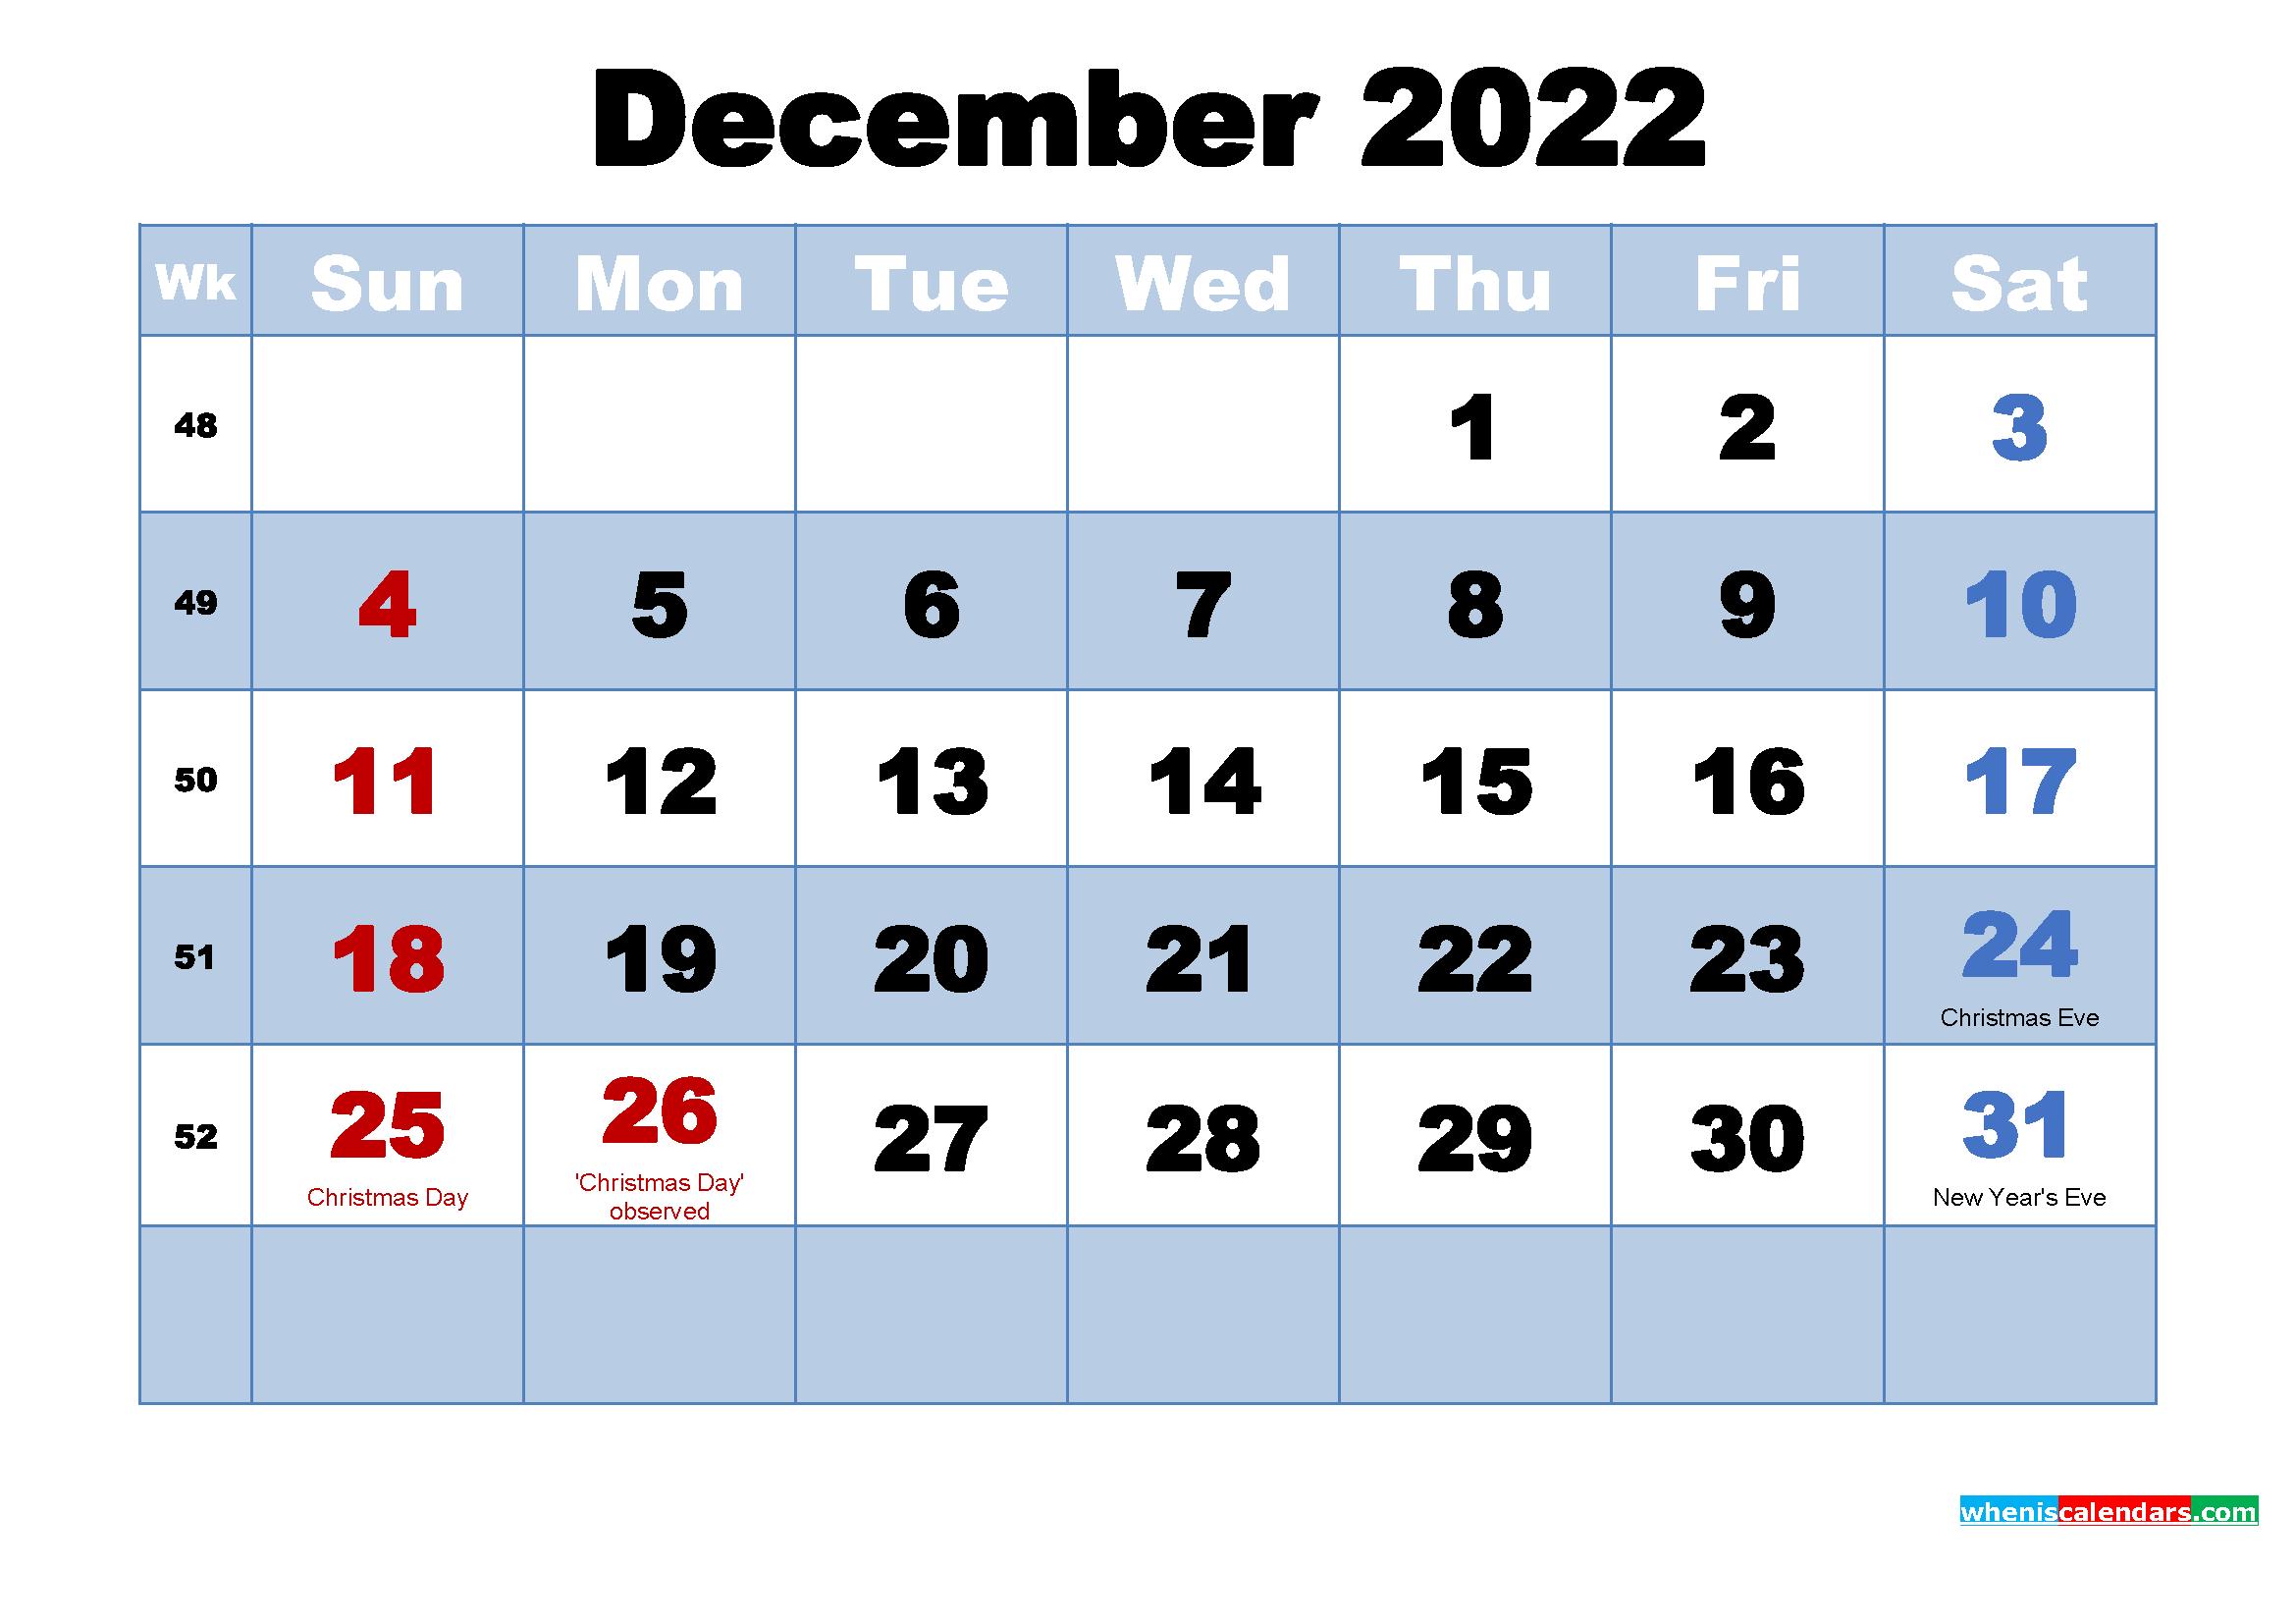 December 2022 Desktop Calendar Monthly